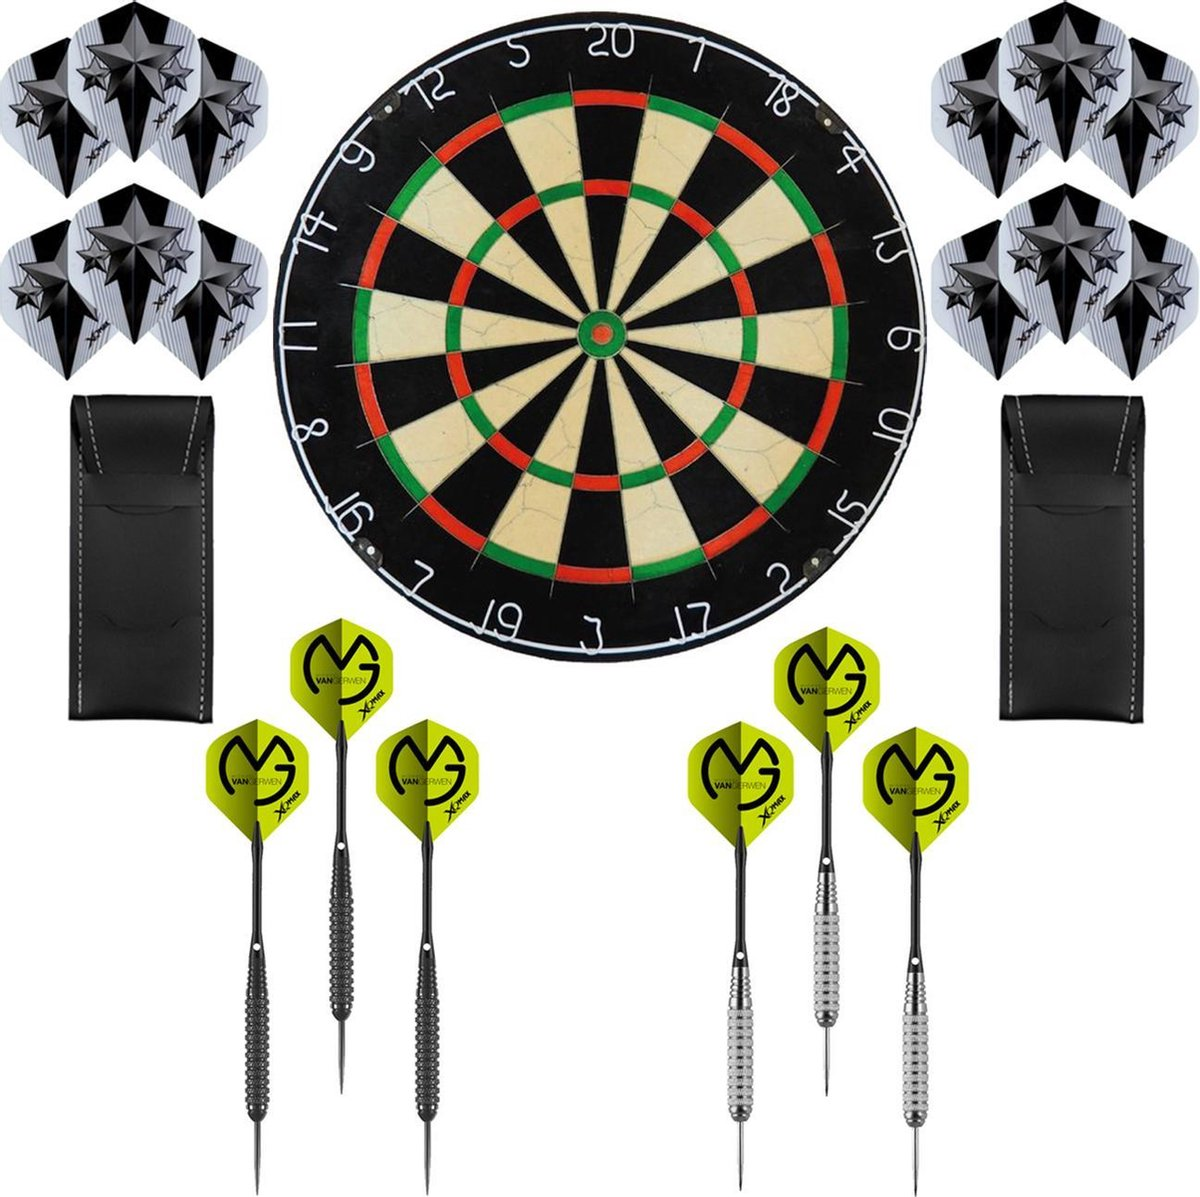 Dragon Darts Michael van Gerwen Precision set - dartbord - 2 sets - dartpijlen - dart shafts - dart flights - Plain A-Merk XQ dartbord